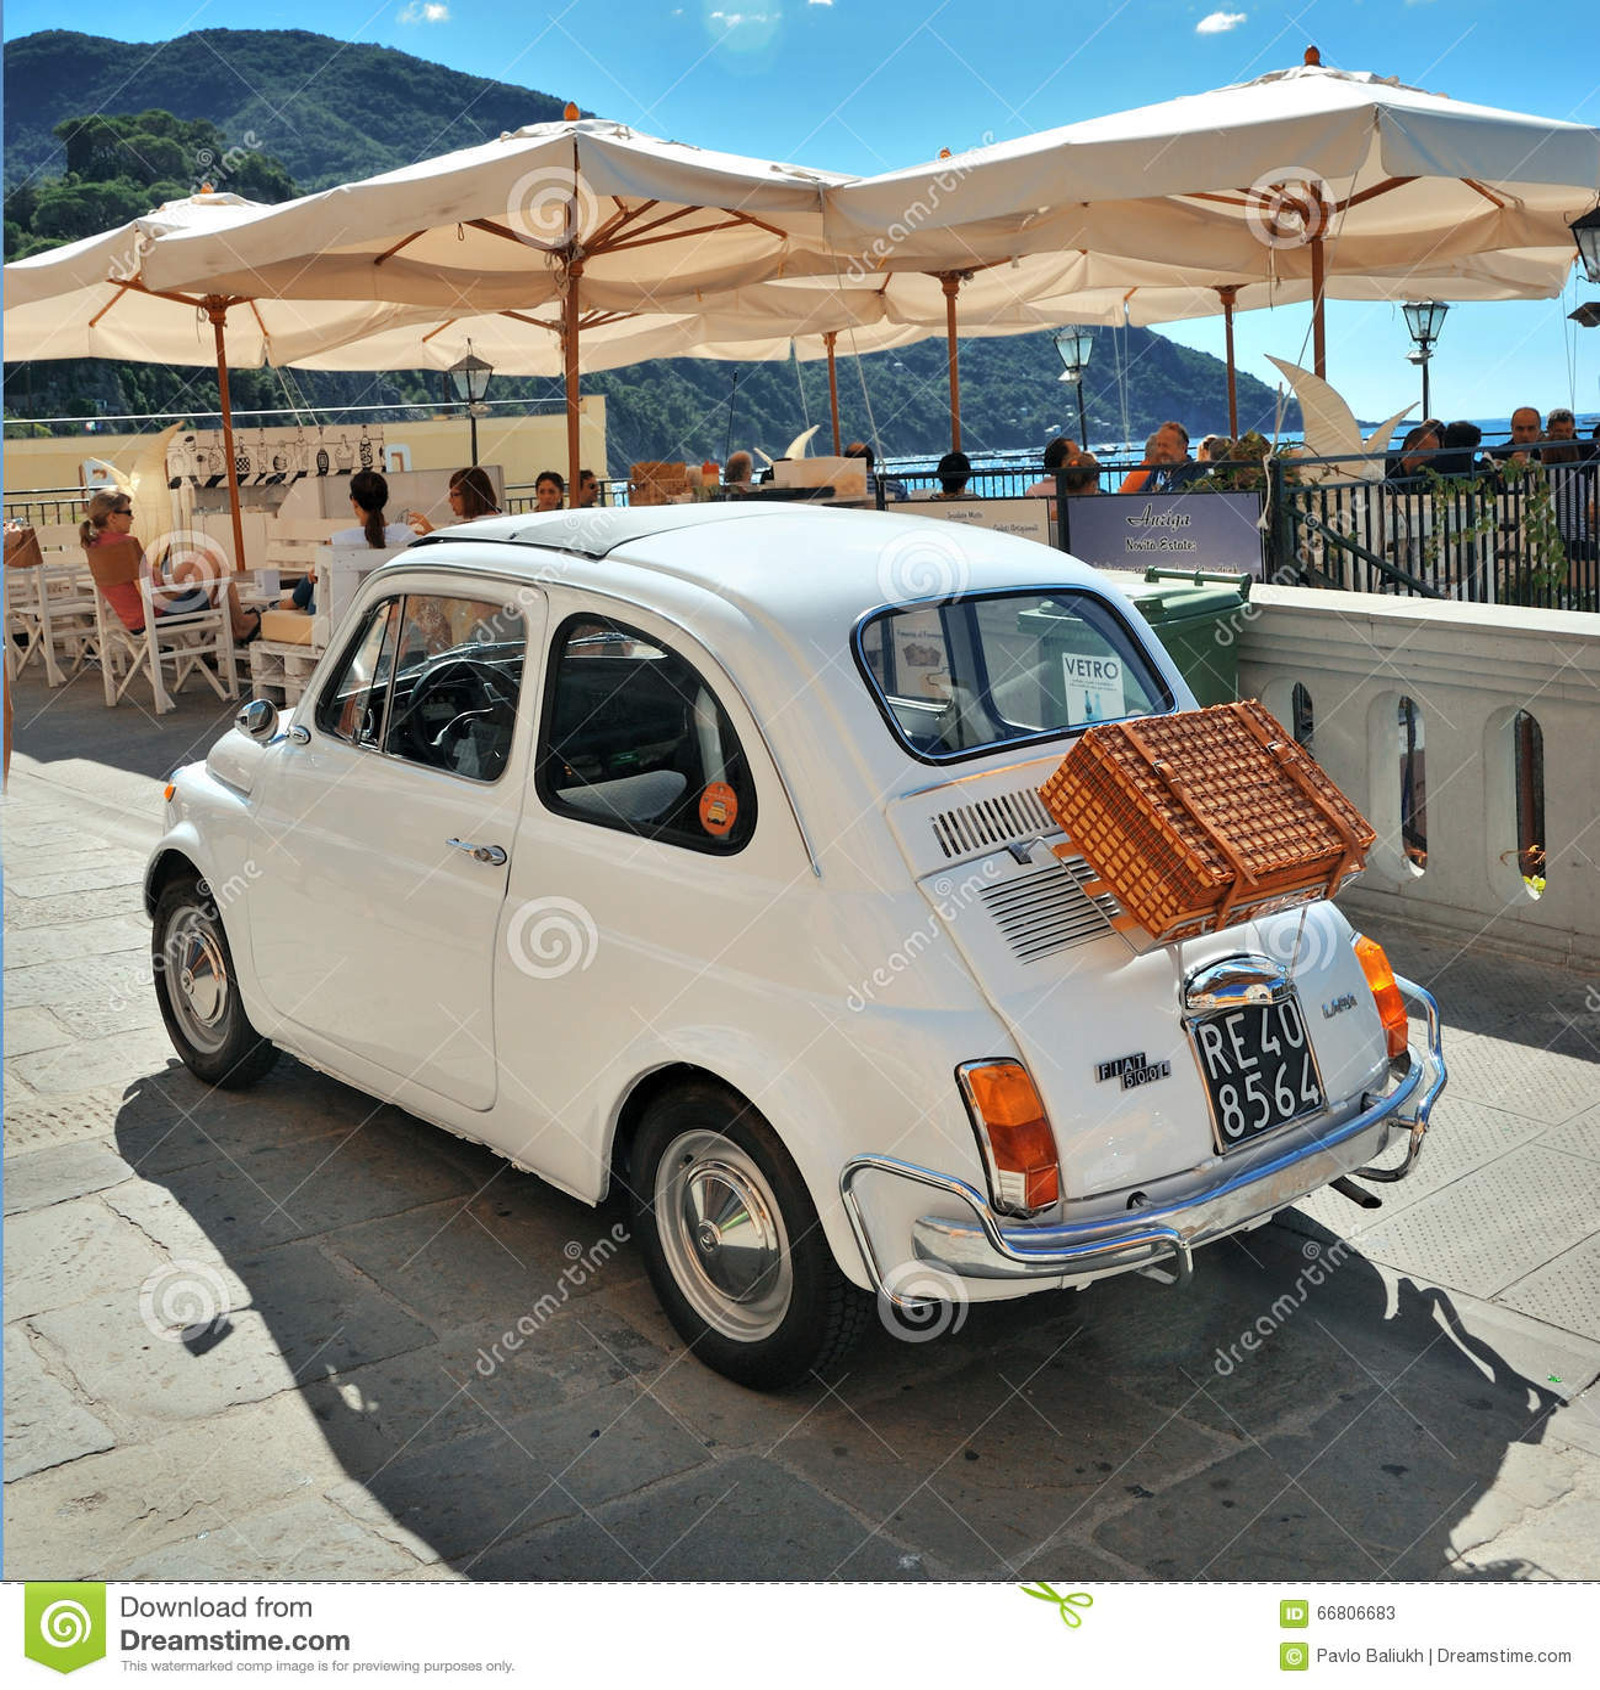 Camogli Liguria Italy September 20 2015 Festival Fiat 500